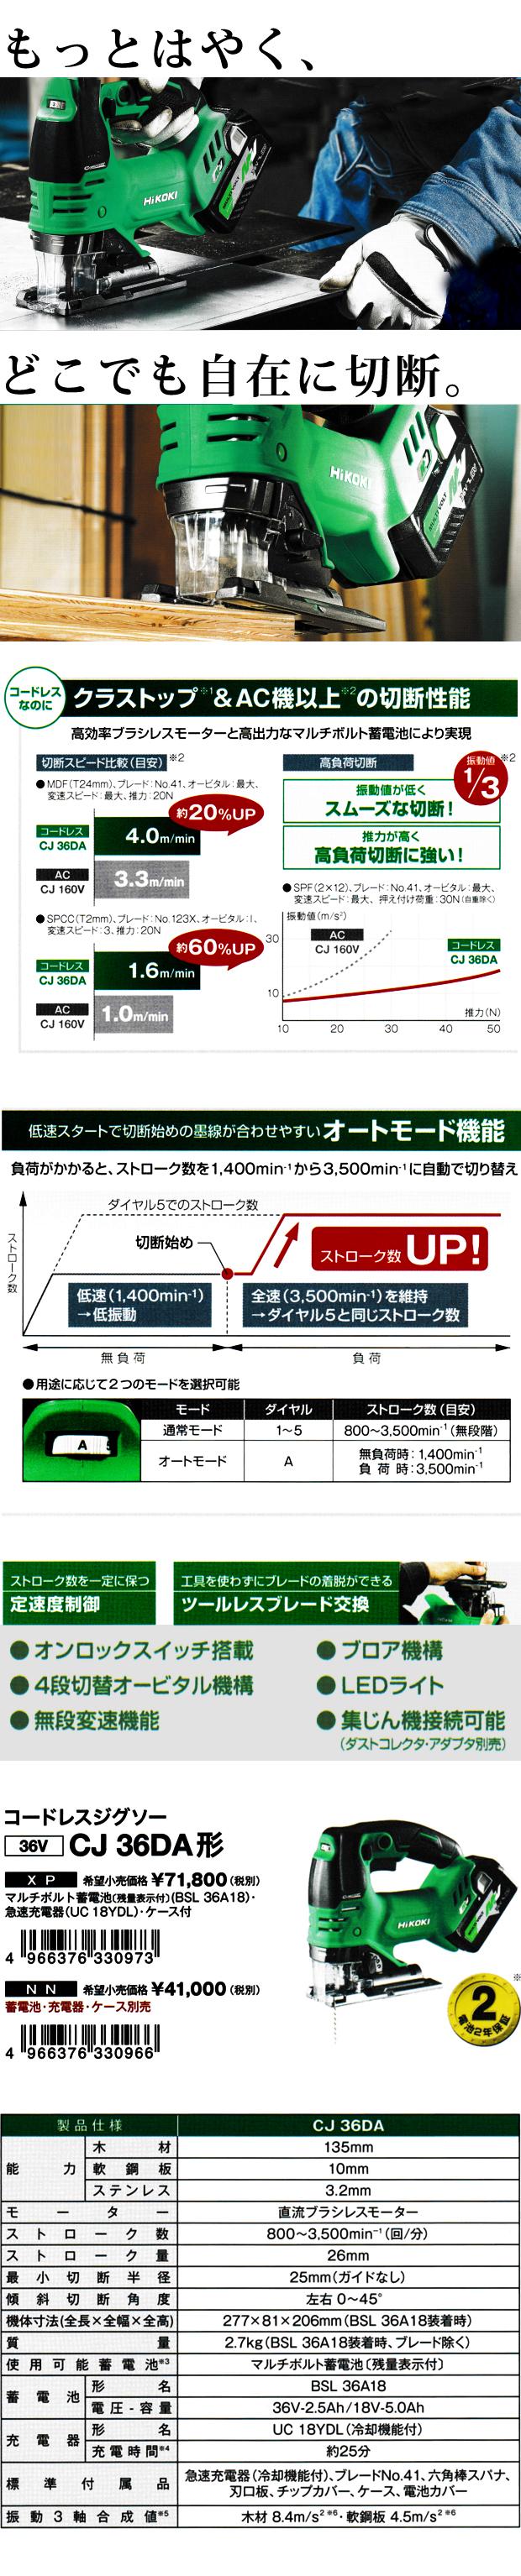 HiKOKI  マルチボルト コードレスジグソーCJ36DA